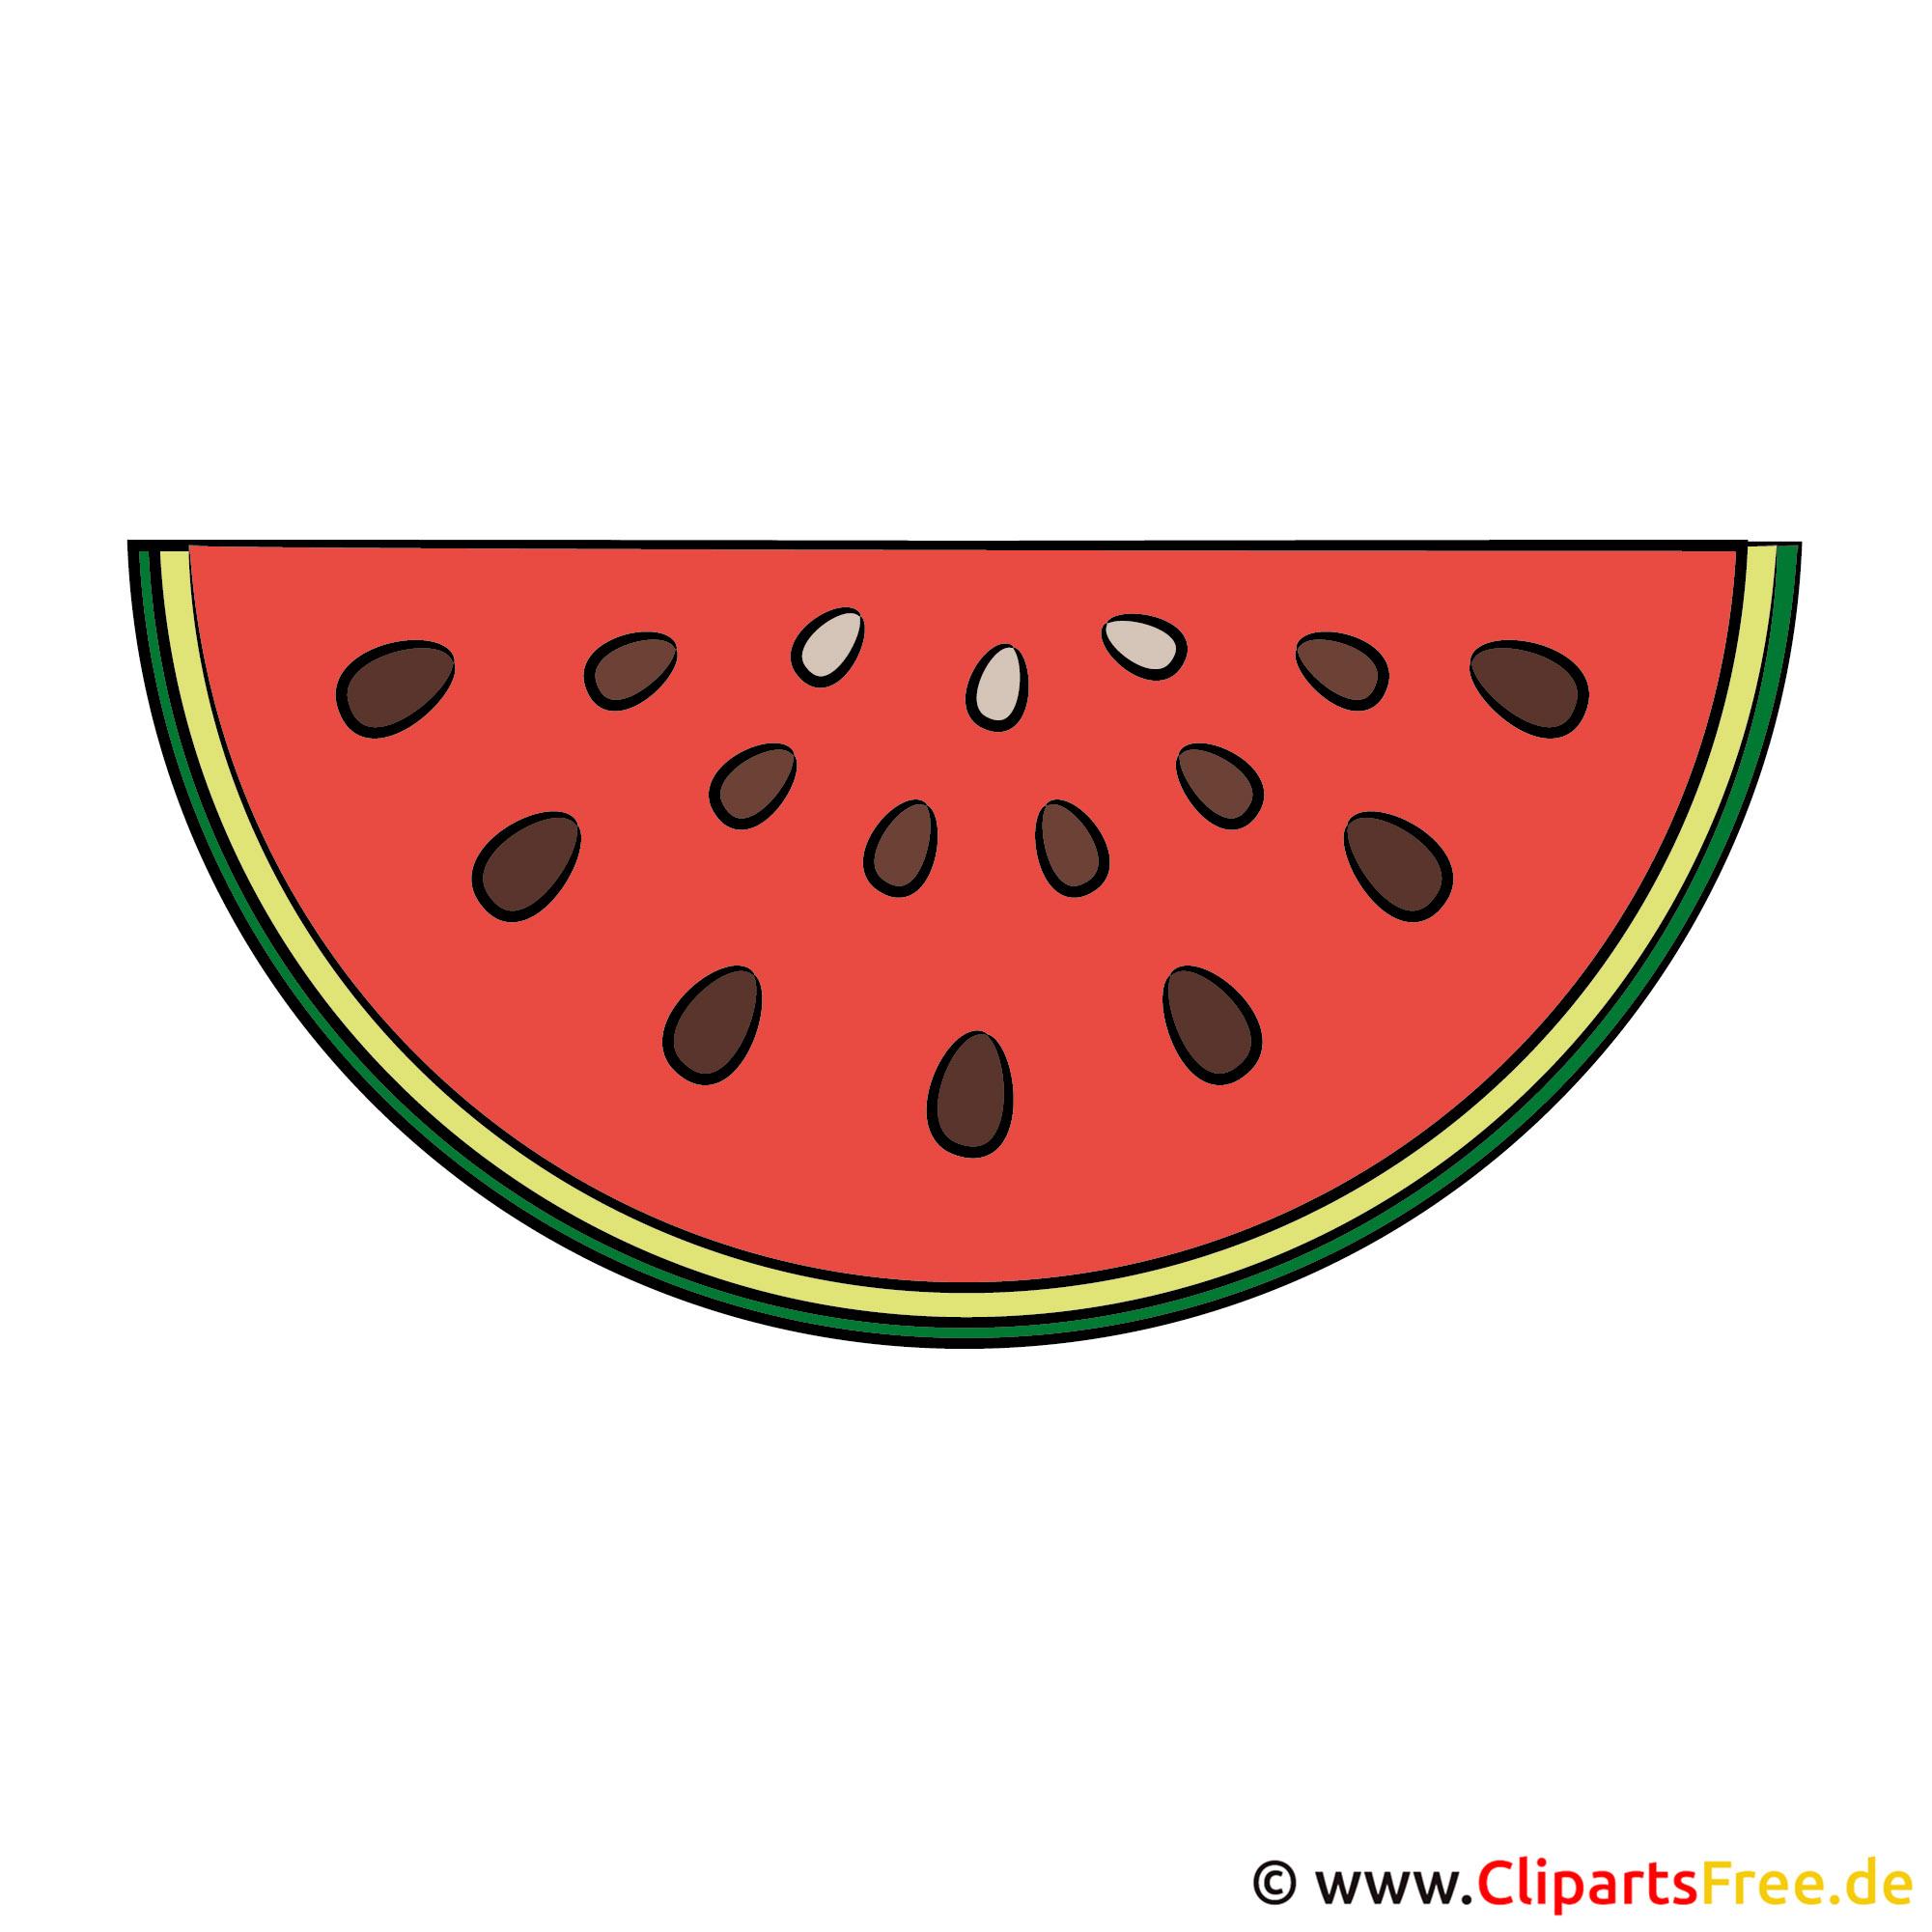 Wassermelone Bild-Clipart